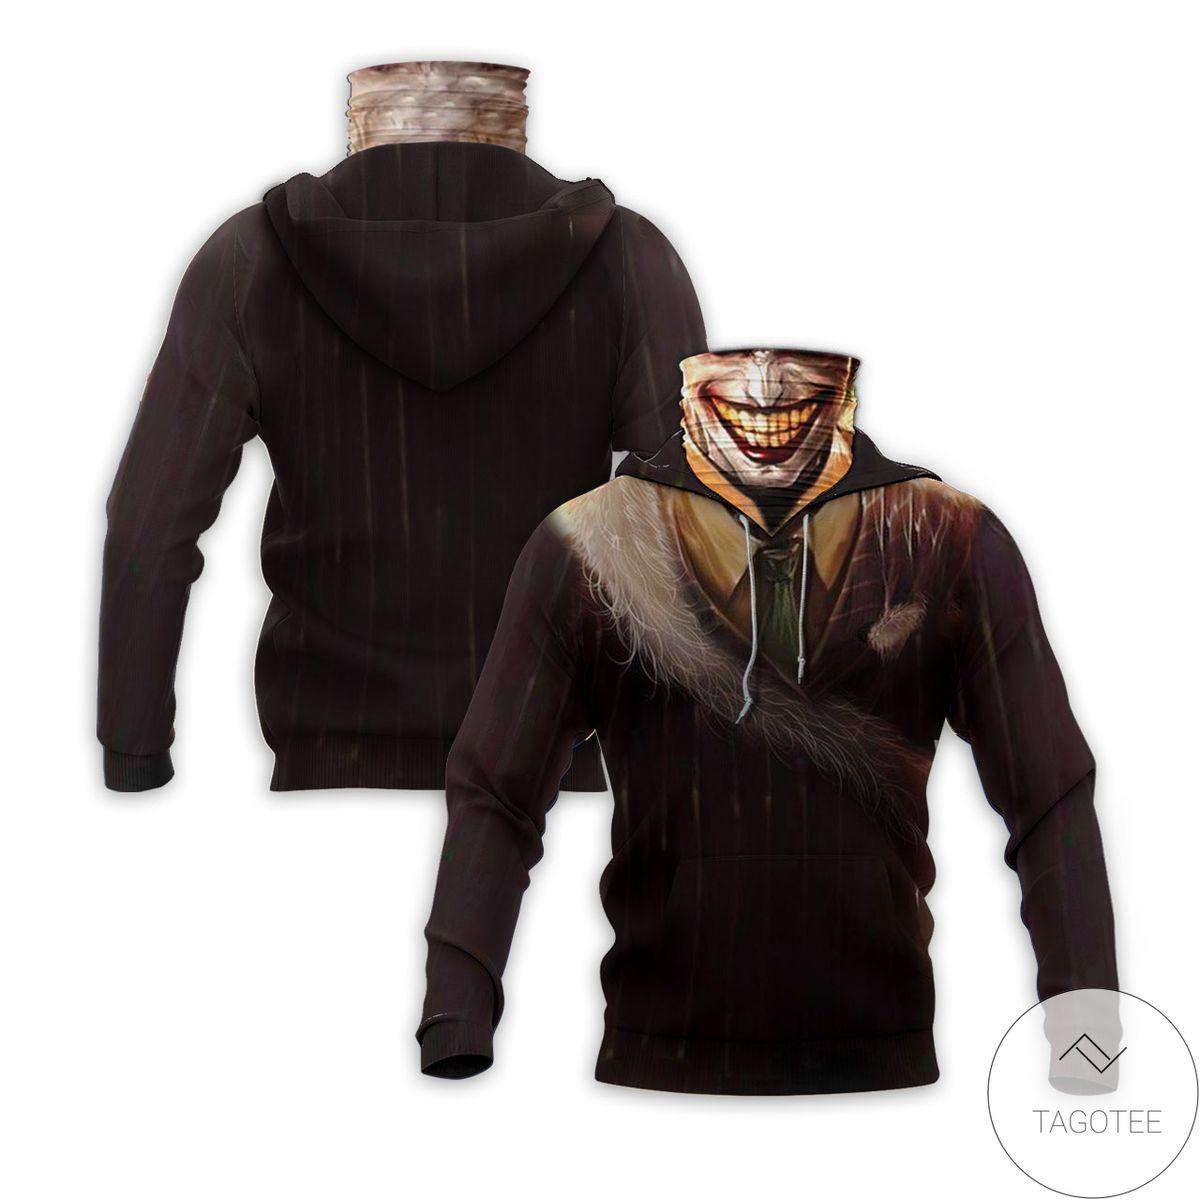 Limited Edition Jocker Creepy Smile Halloween Mask Hoodie